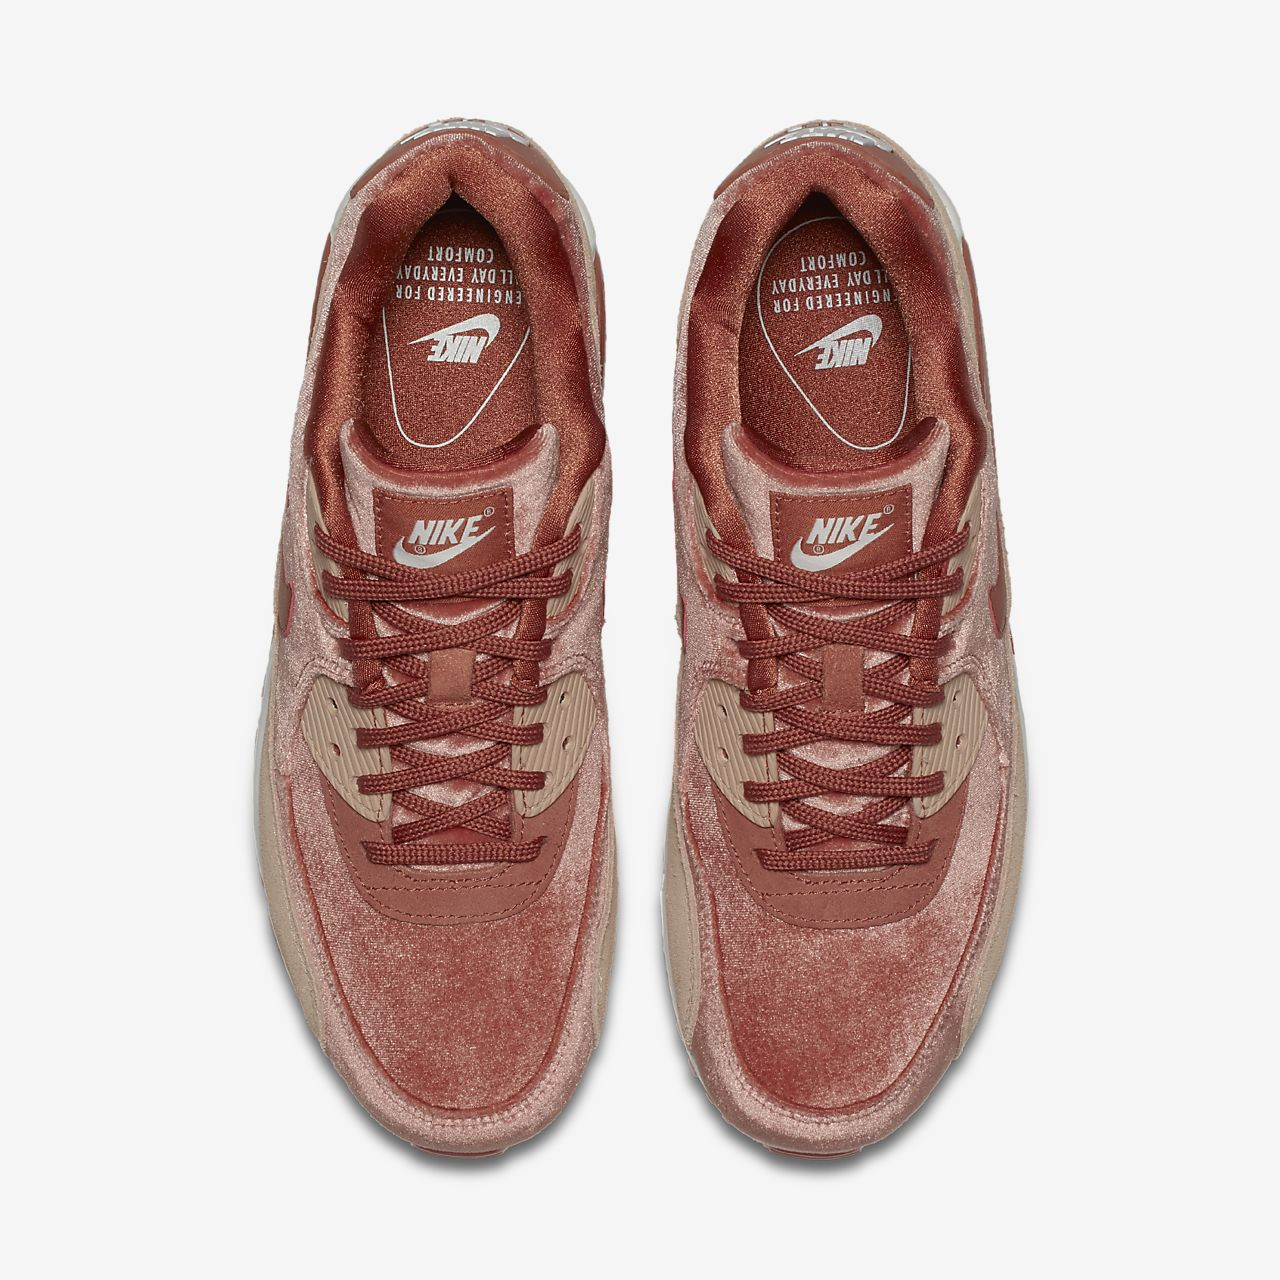 nike air max 90 velvet trainers in rose